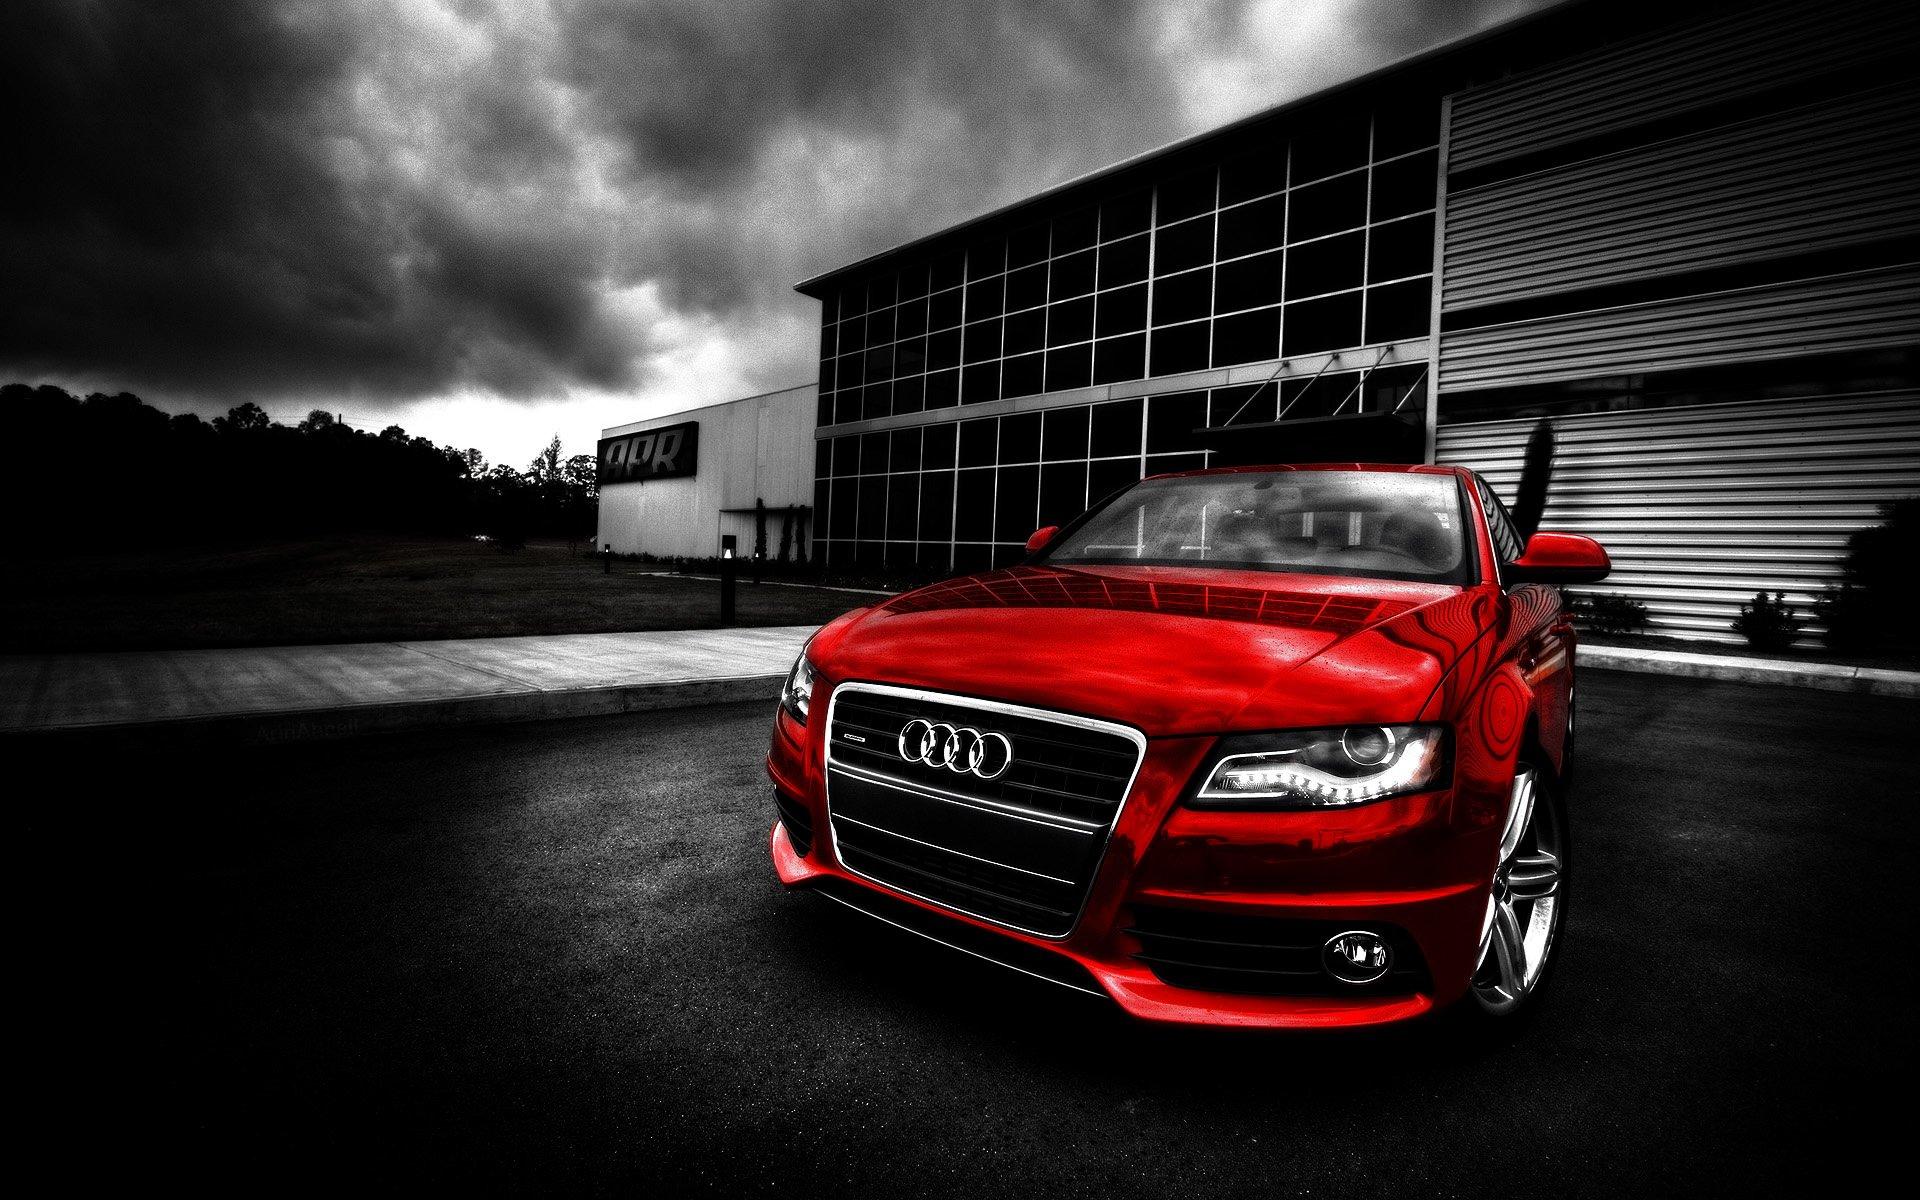 Audi Wallpaper HD